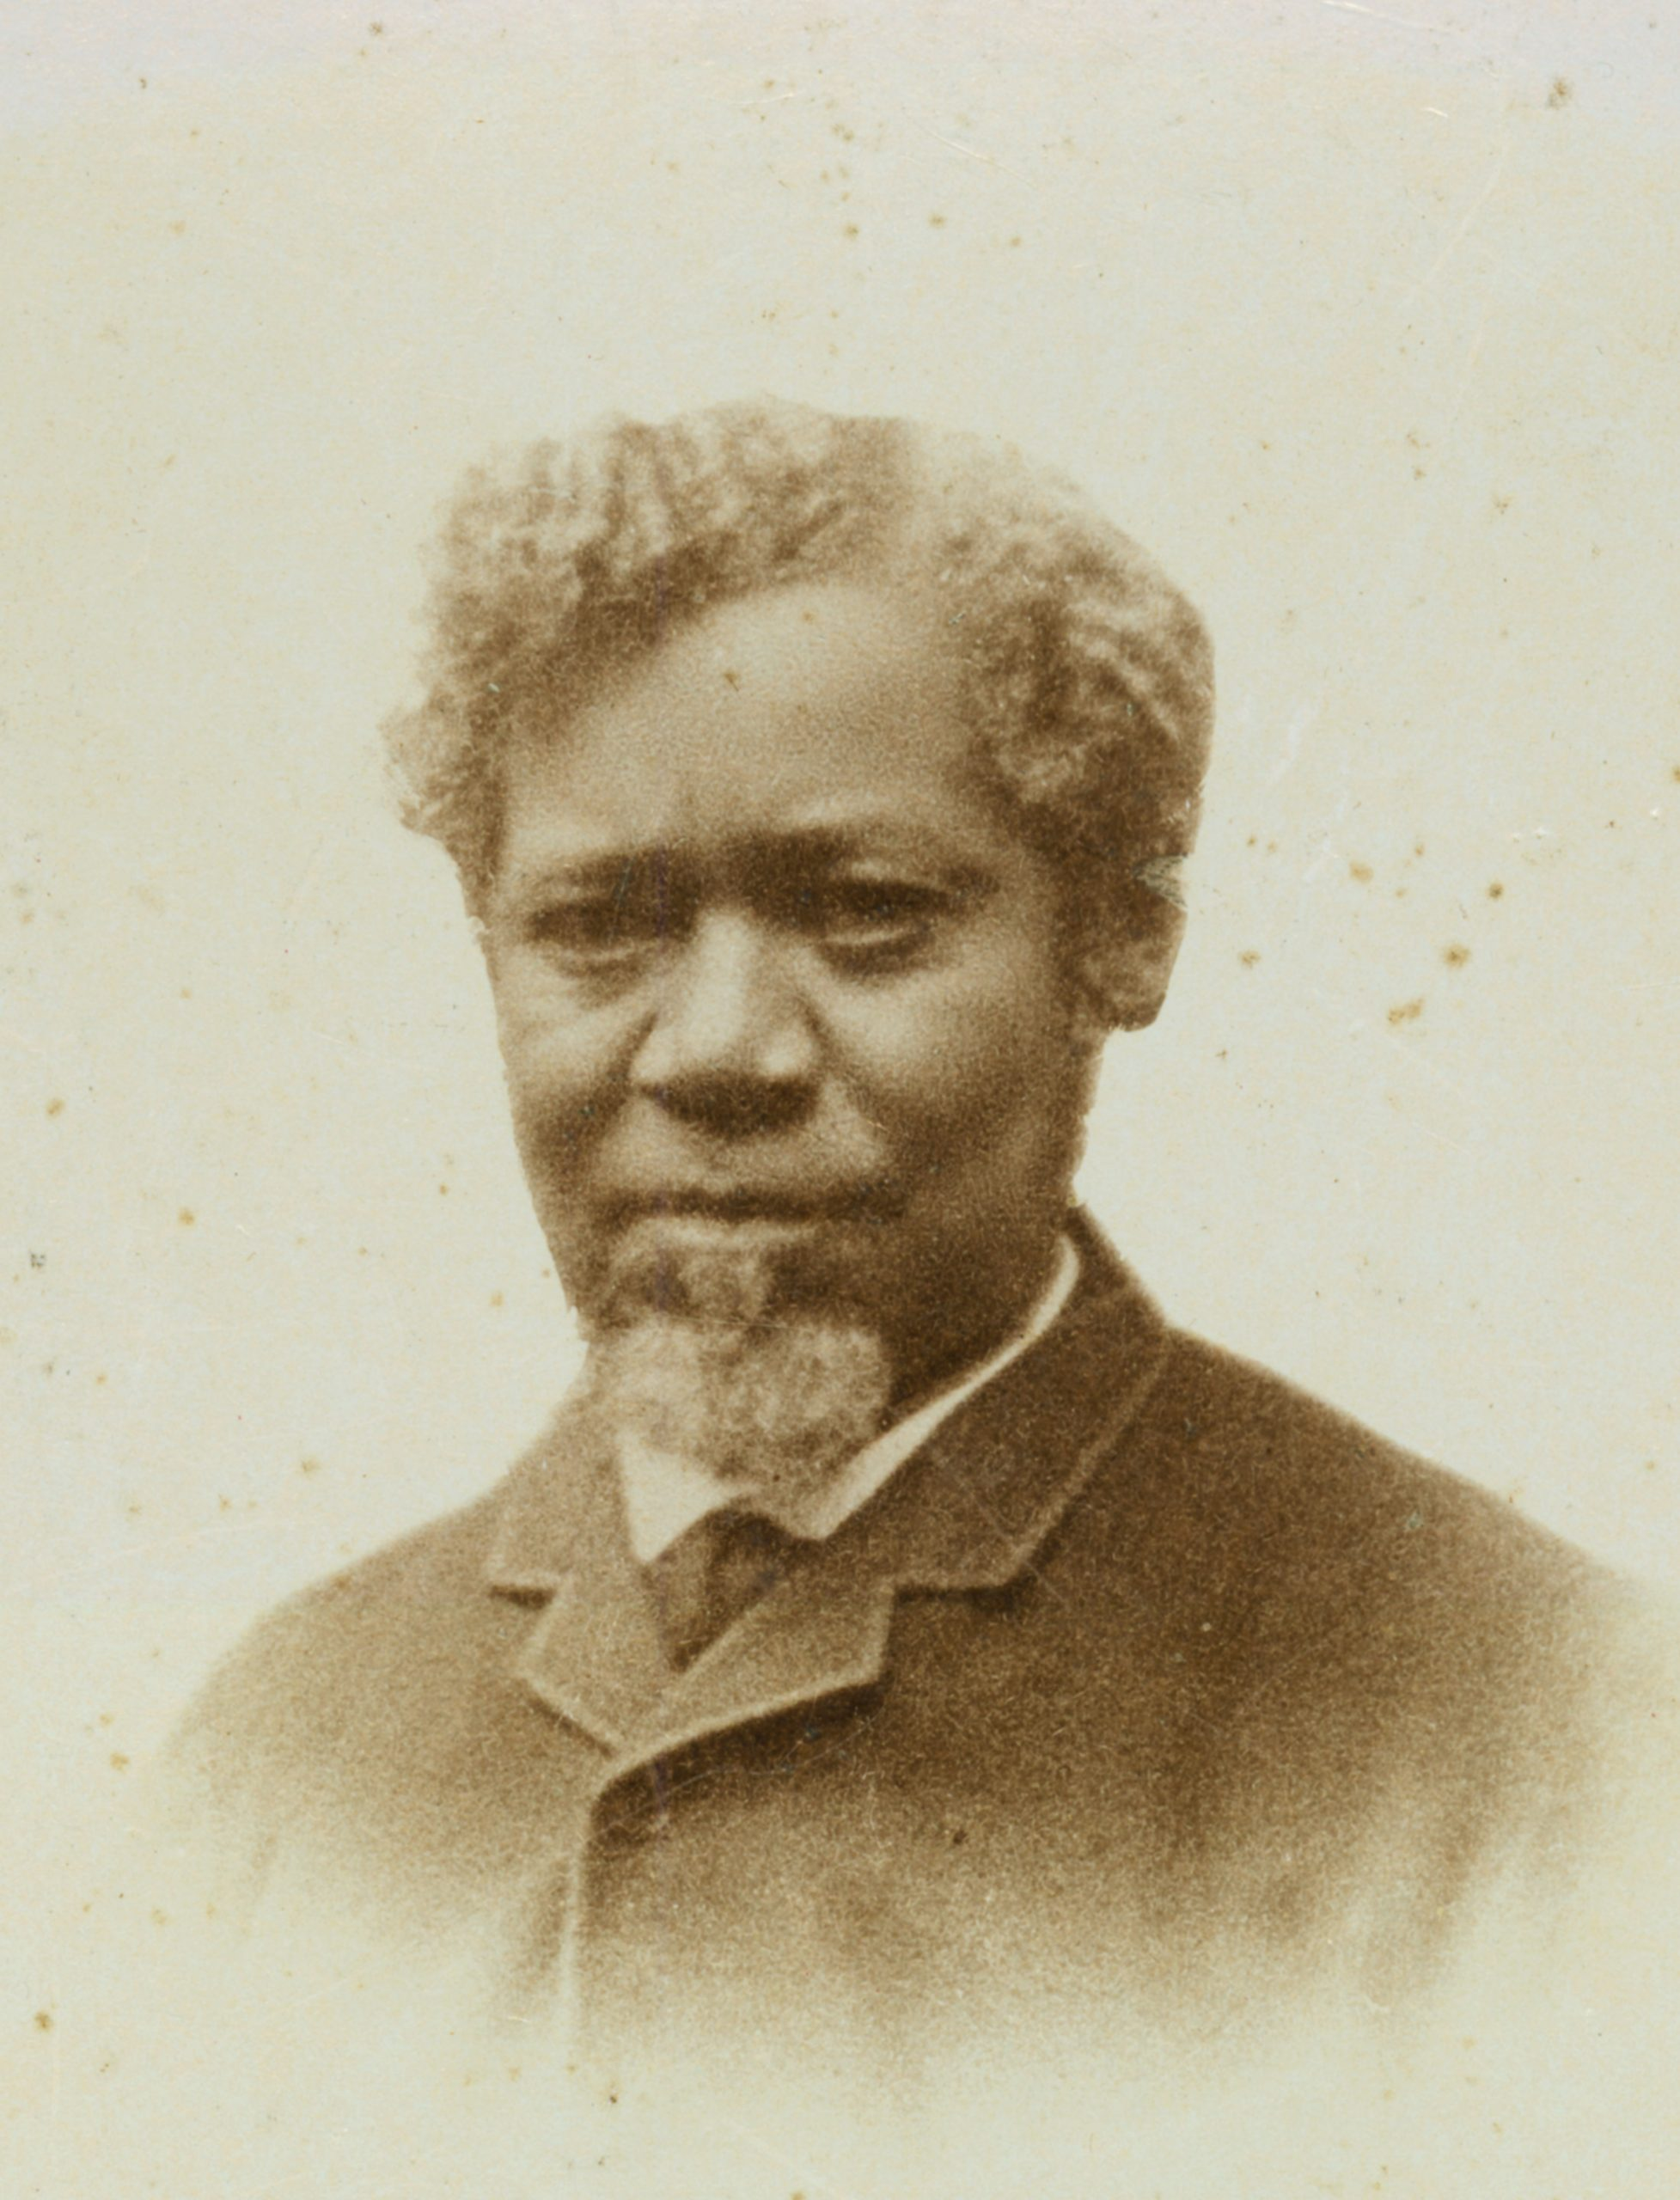 Afro-niederländische Geschichte, Amsterdam, Suriname, Ghana; Hendrik van Guinea Charles (1827-1899)